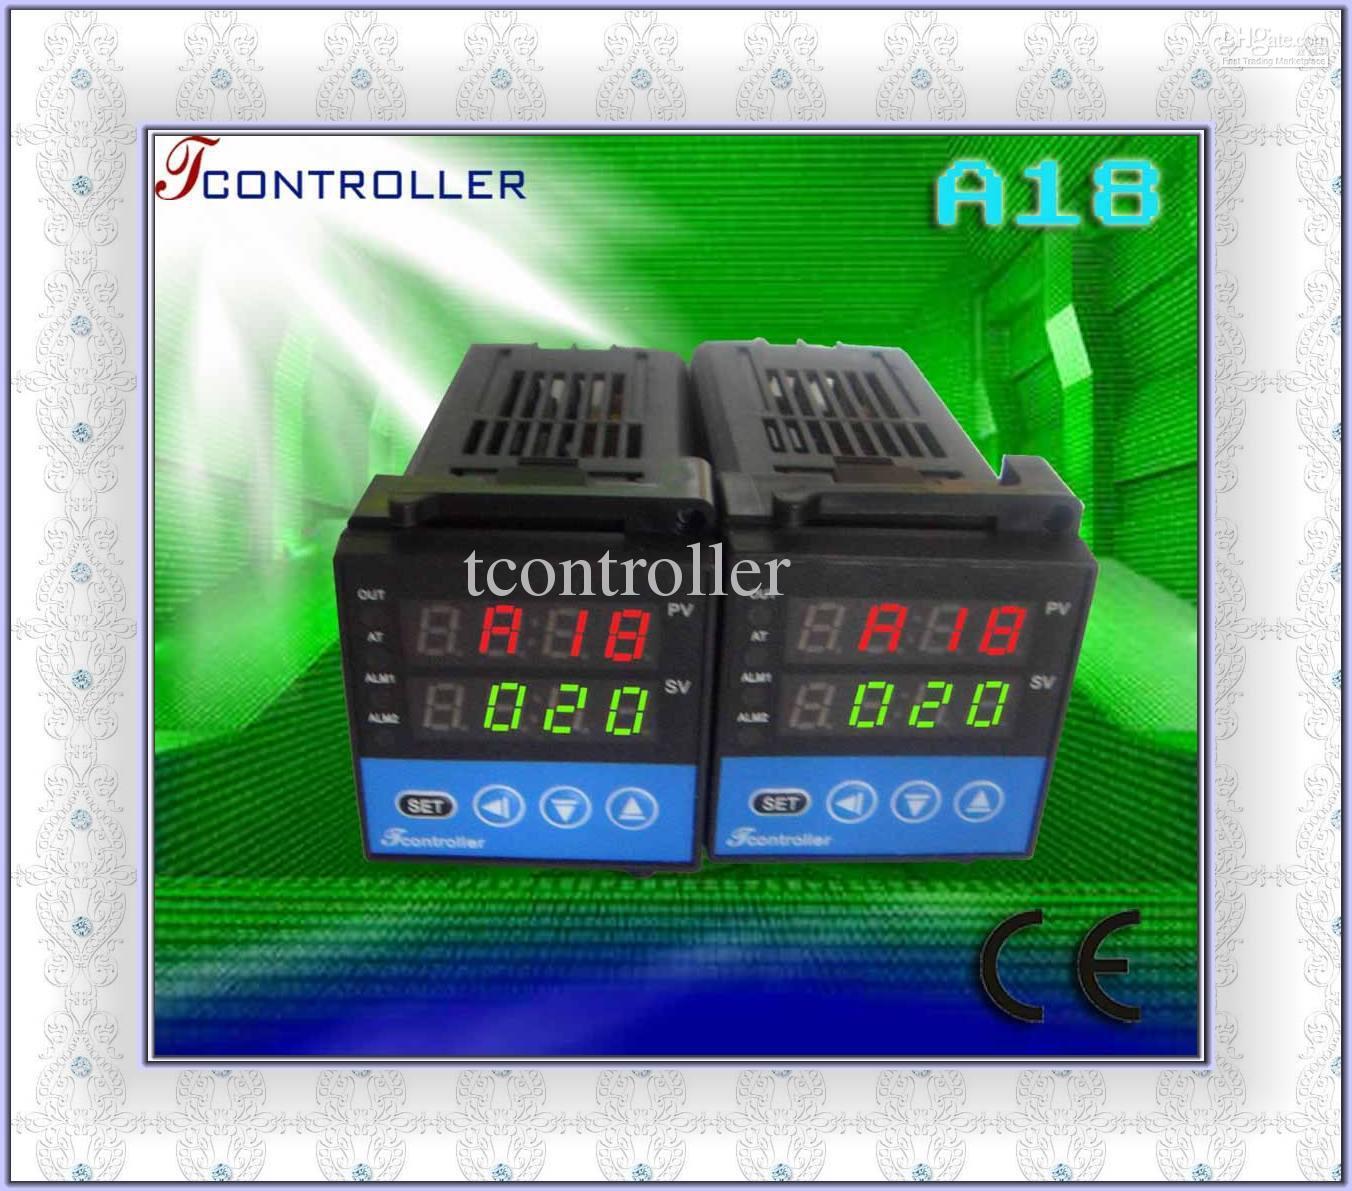 2016 Digital Temperature Controller Incubator A1848*48 From  #0C1E82